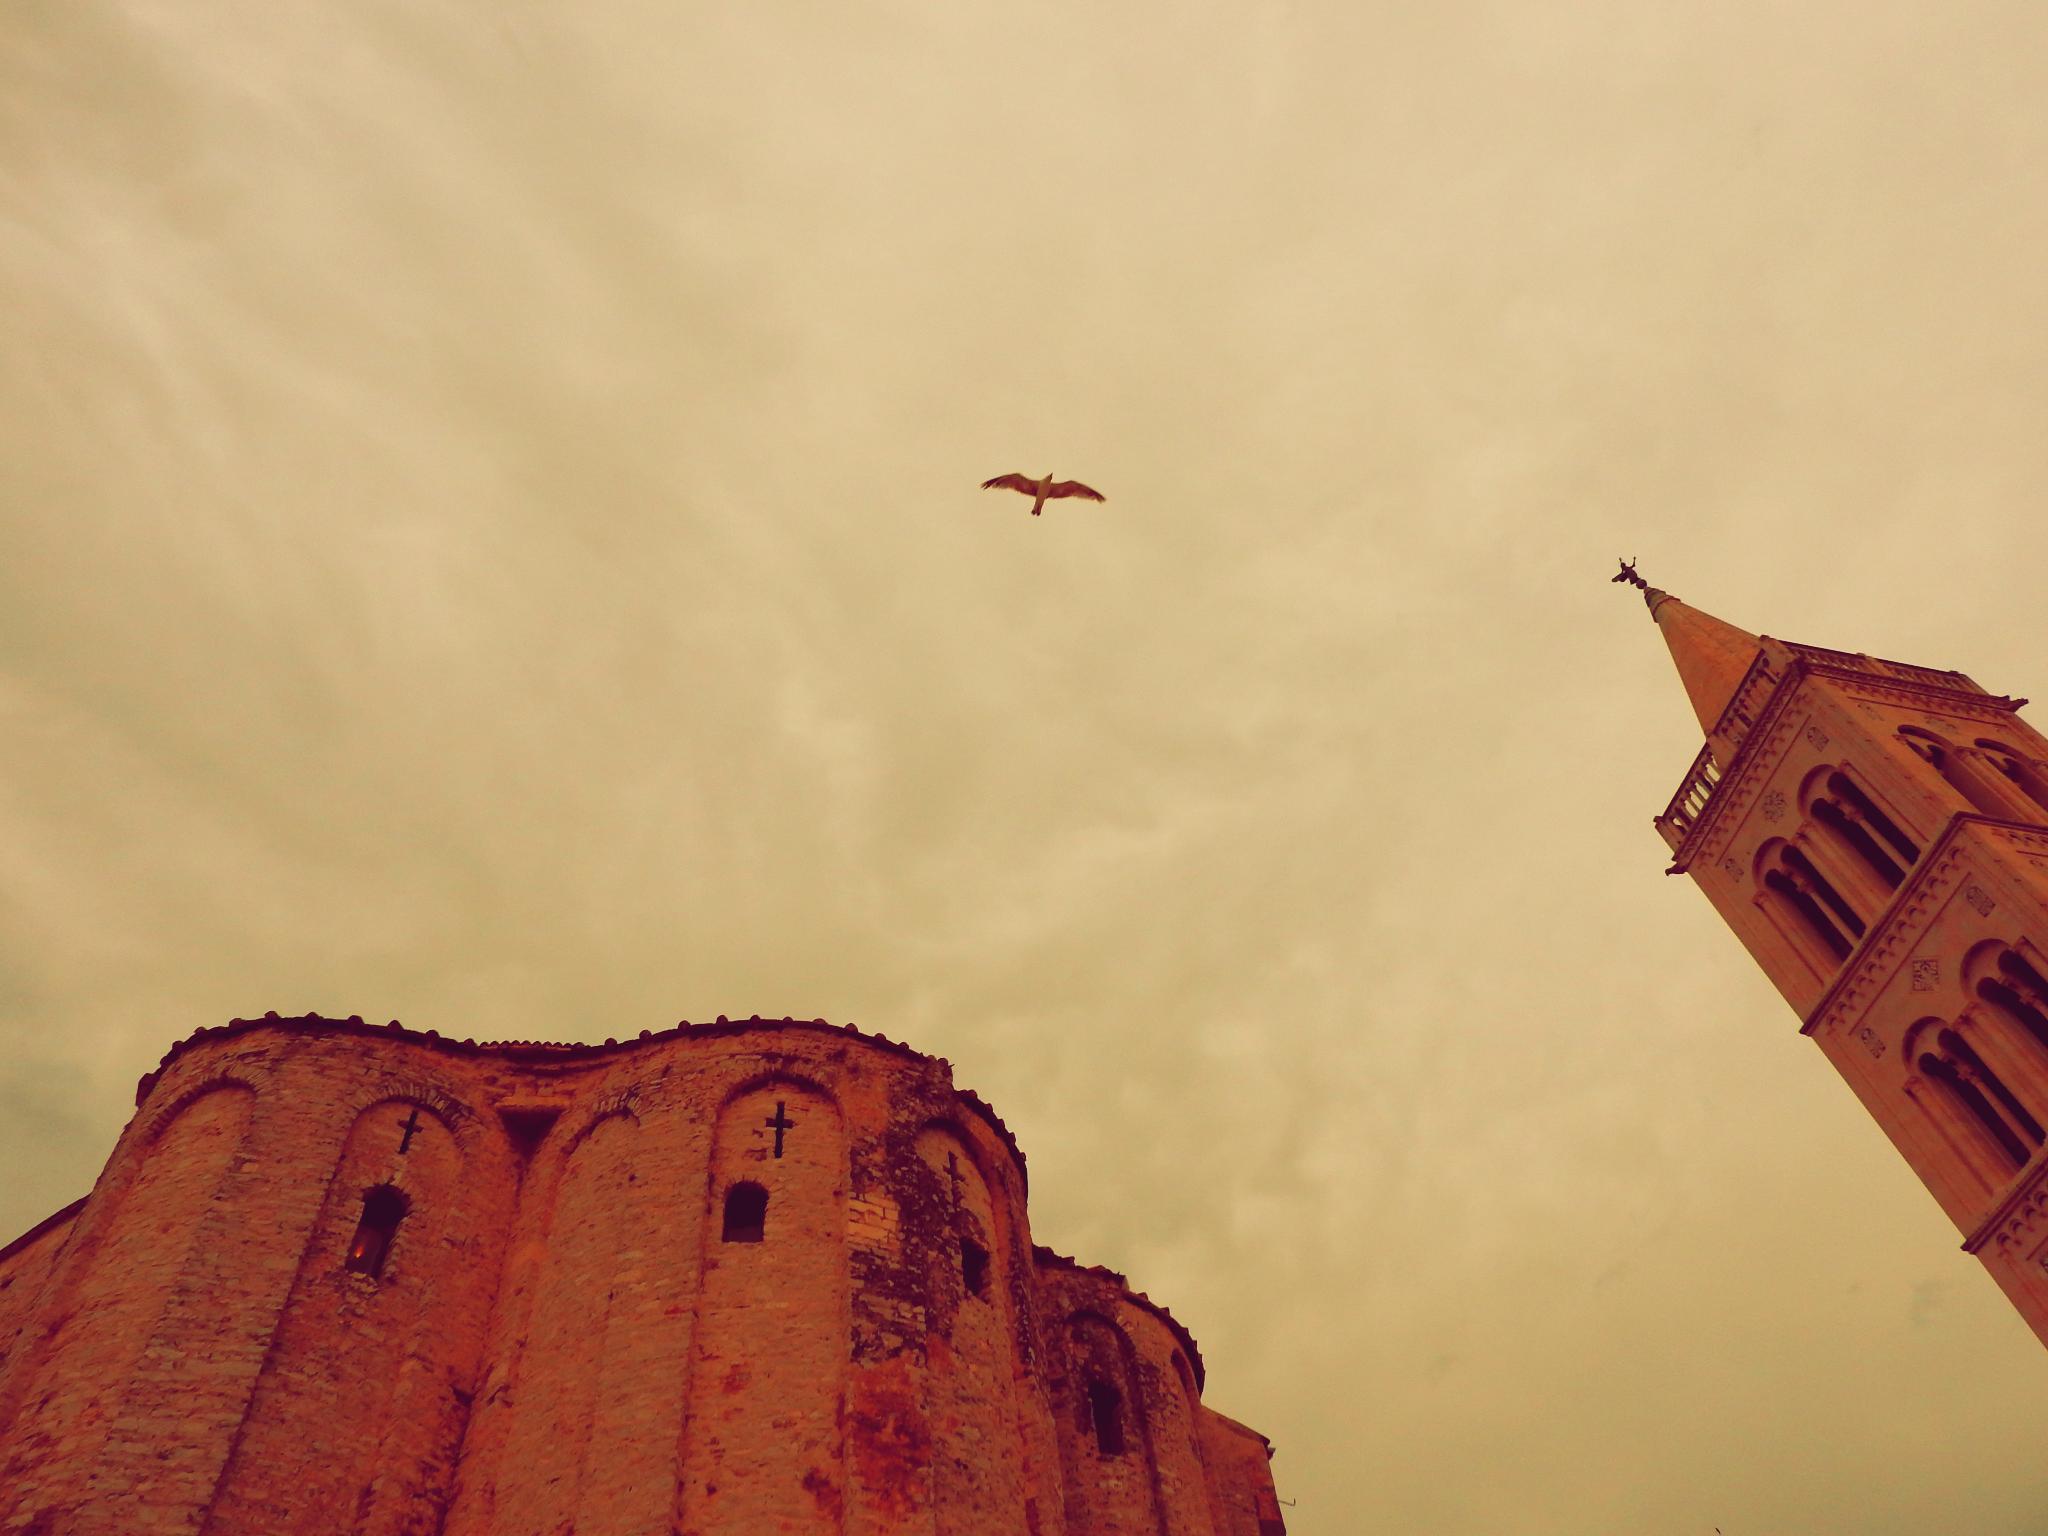 Zadar Old Town